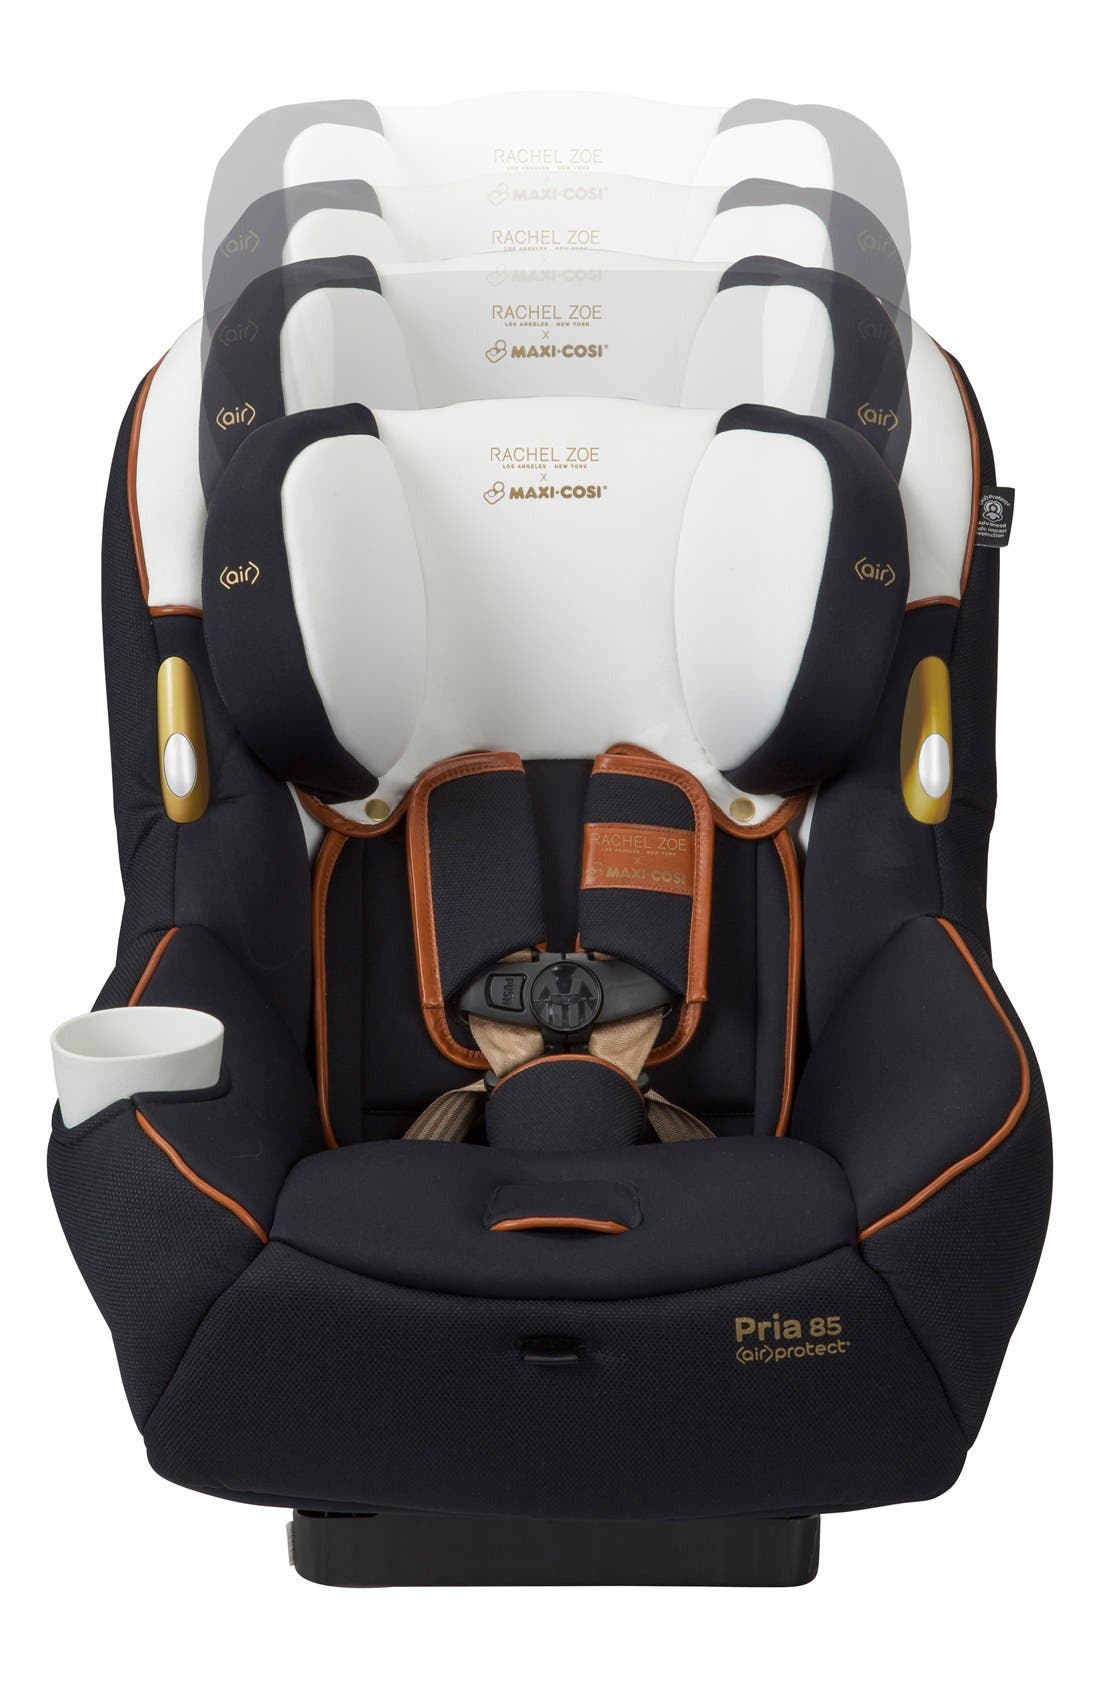 x Rachel Zoe Pria<sup>™</sup> 85 - Special Edition Car Seat,                             Alternate thumbnail 7, color,                             Black/ White